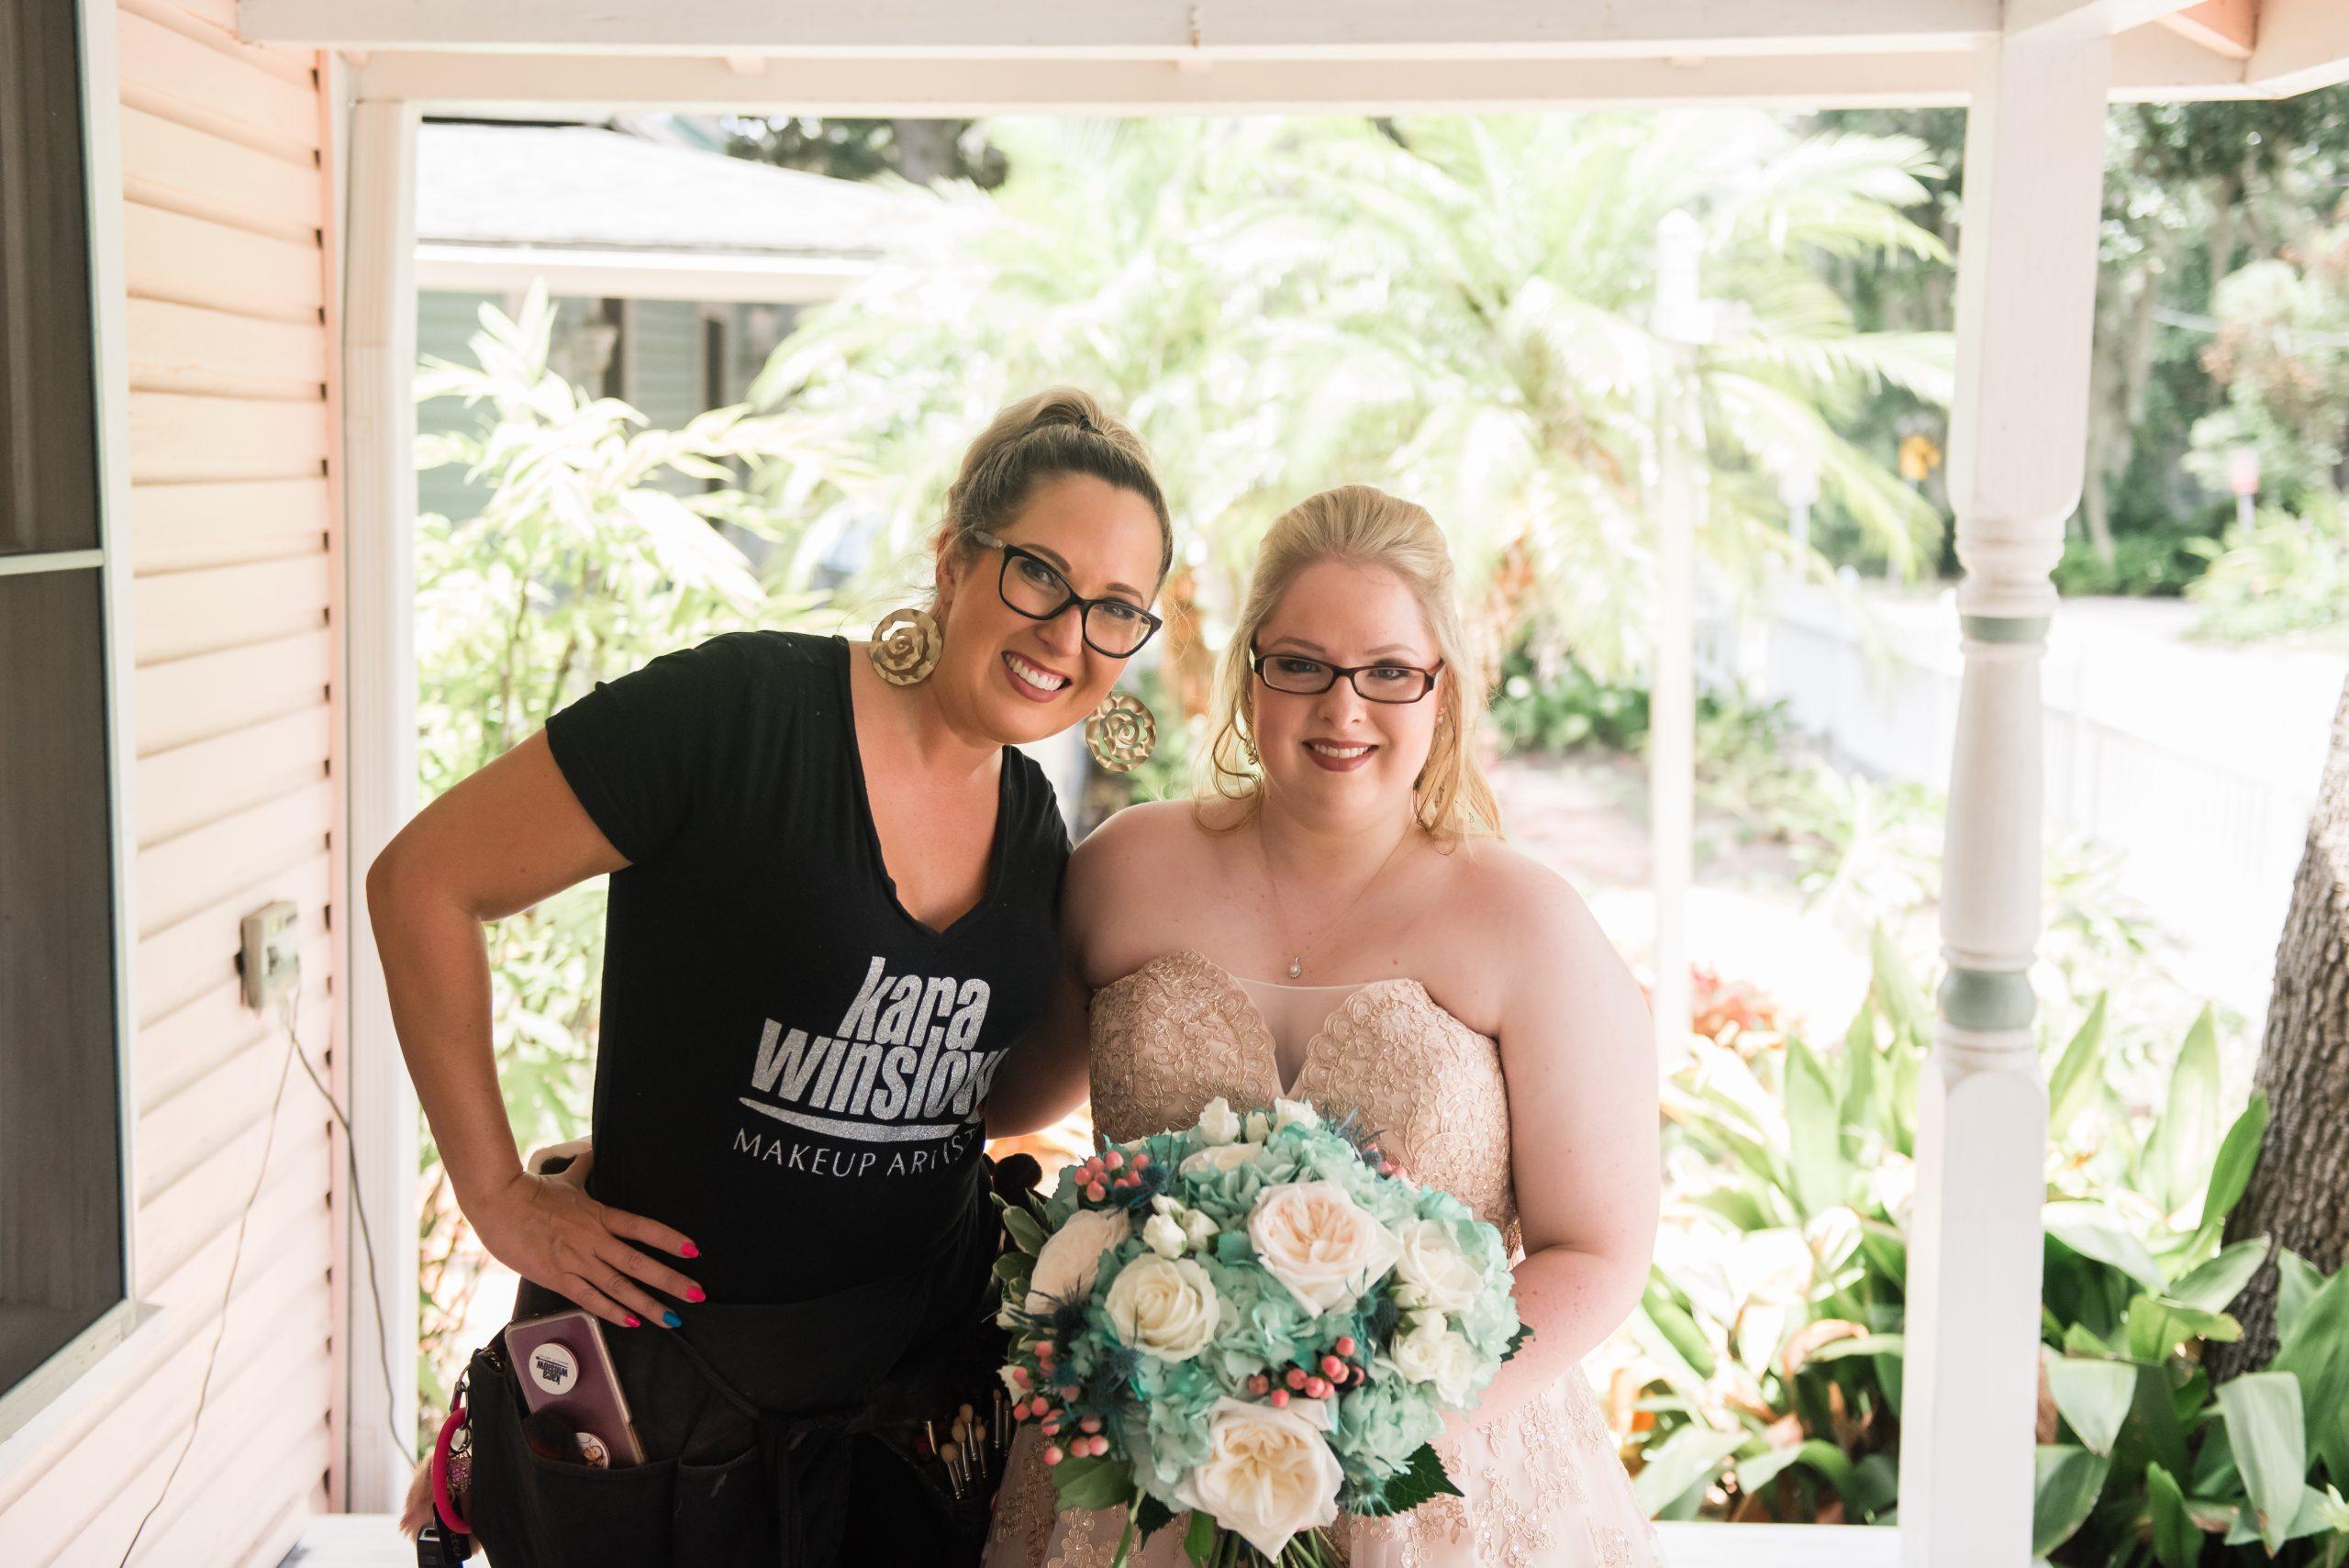 Kara Winslow Wedding Makeup Artist Gainesville Florida